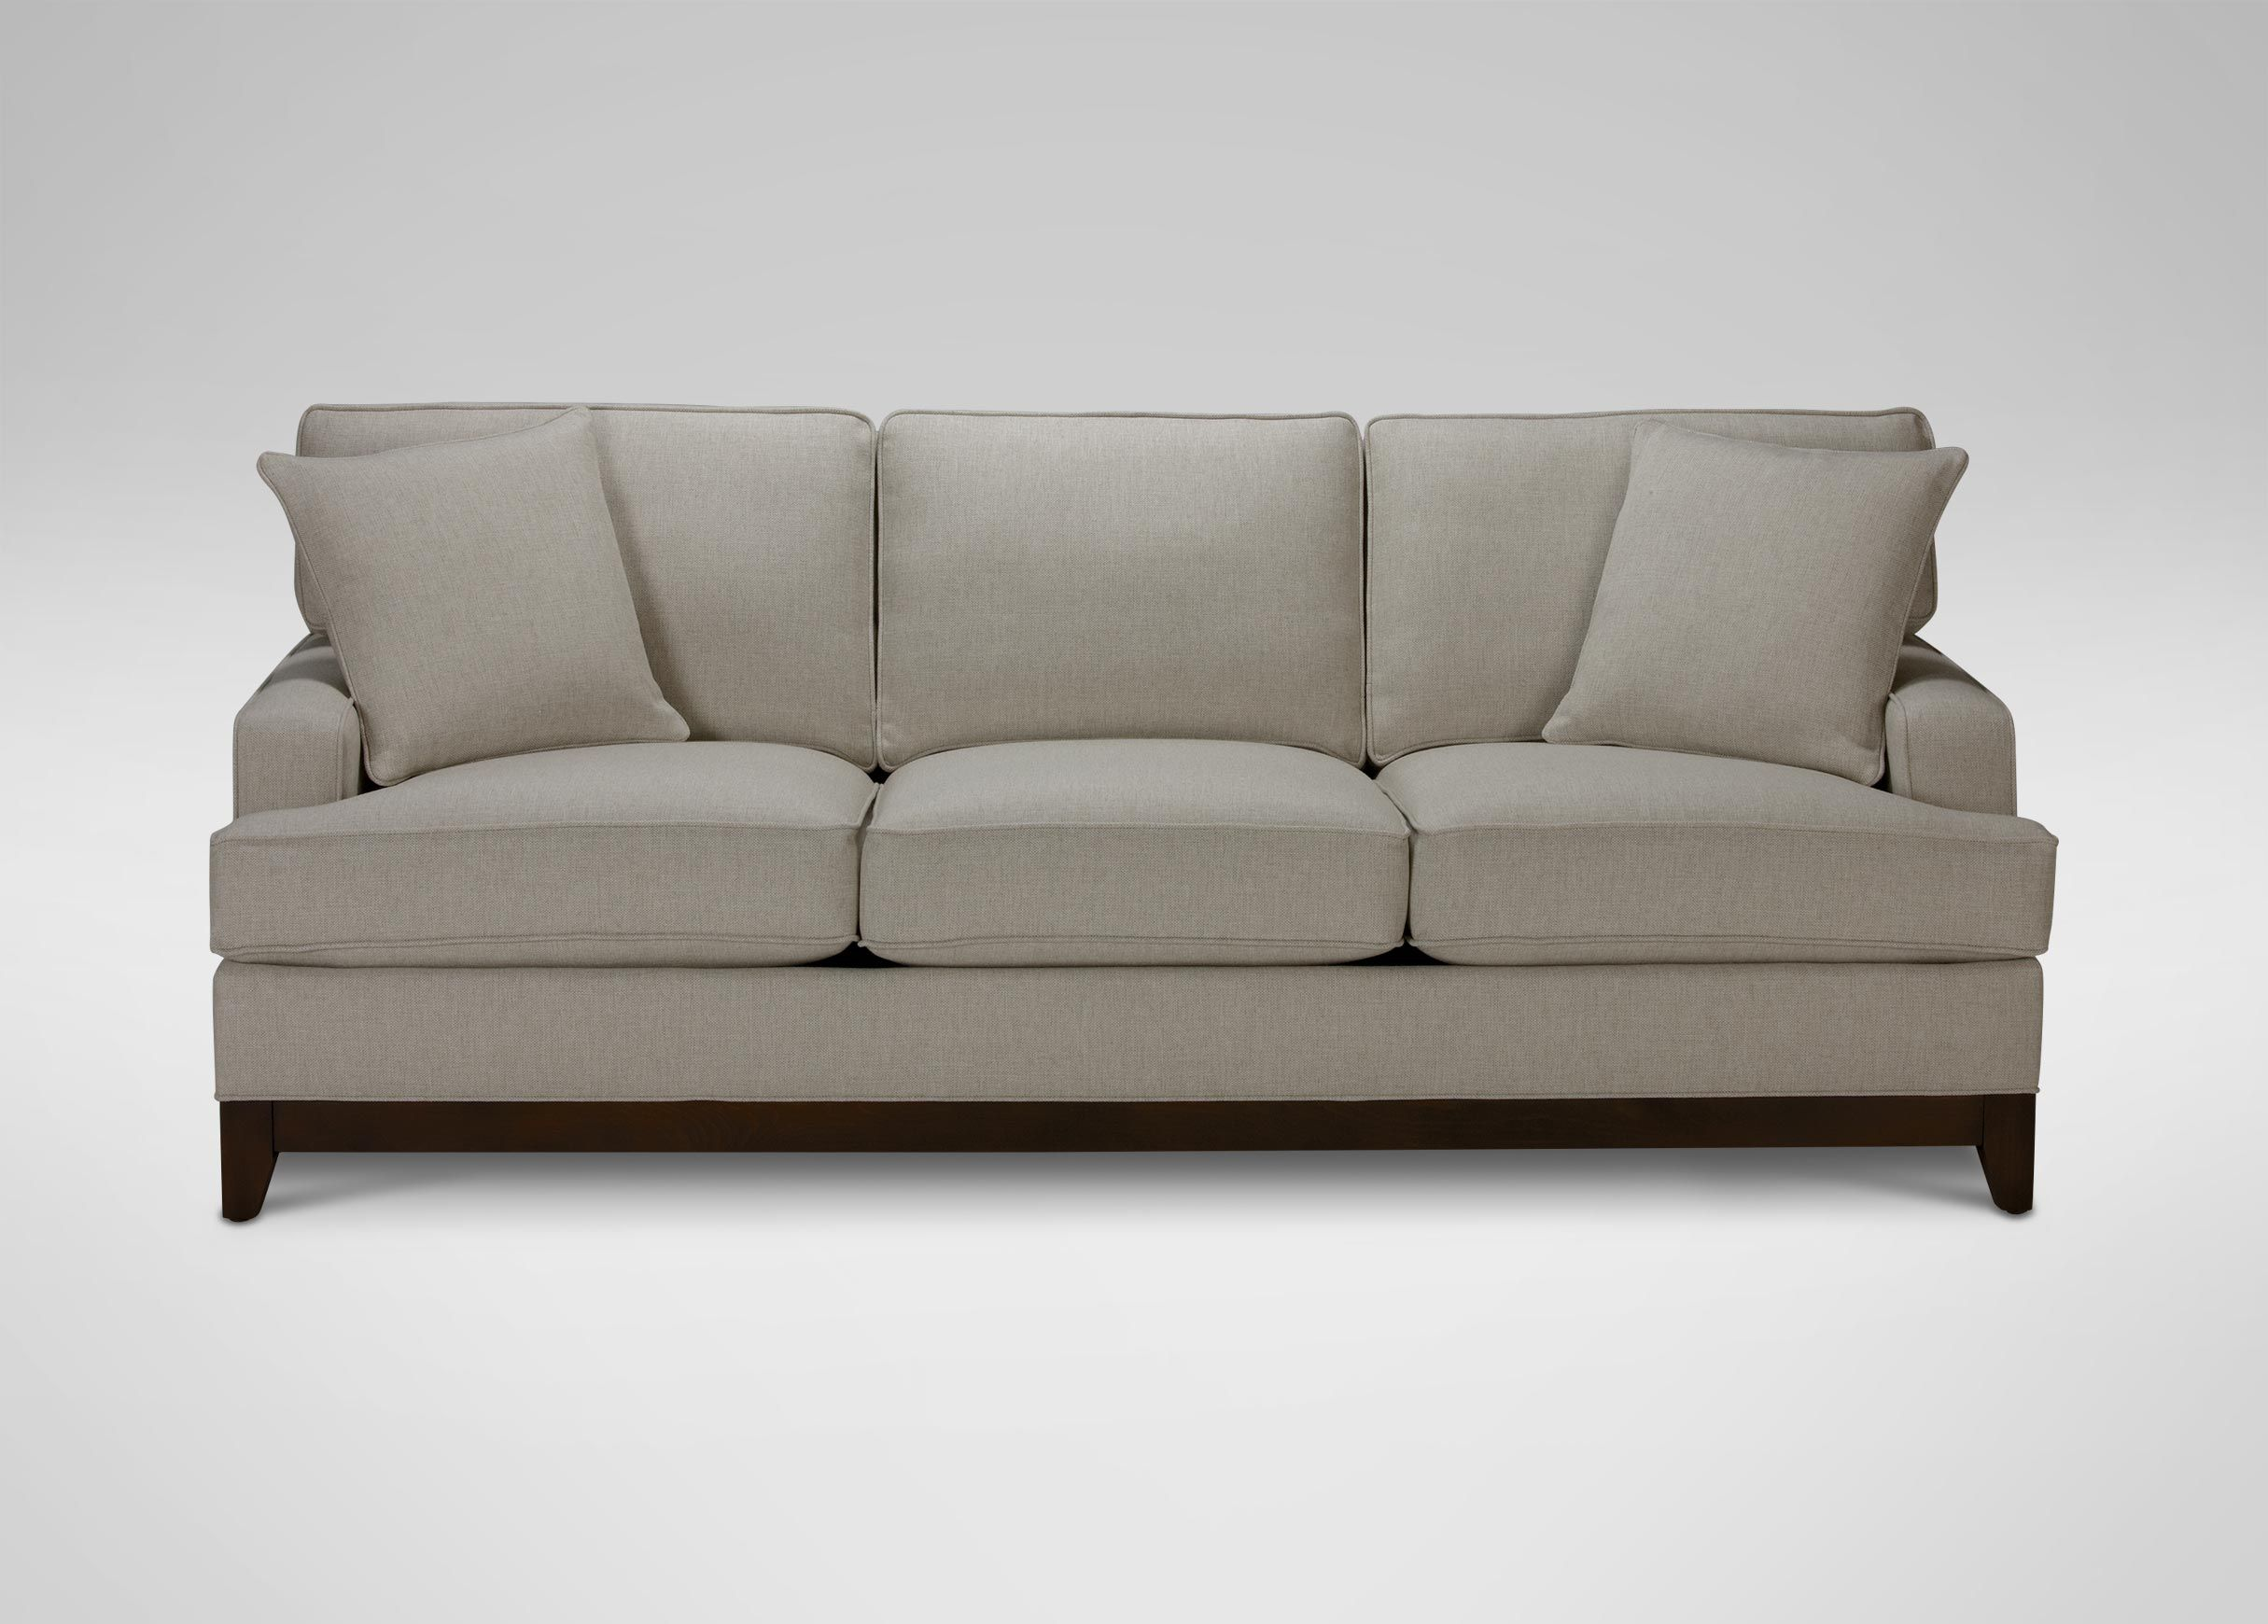 leather possibilities track arm sofa modular design 2018 quick ship sofas baci living room